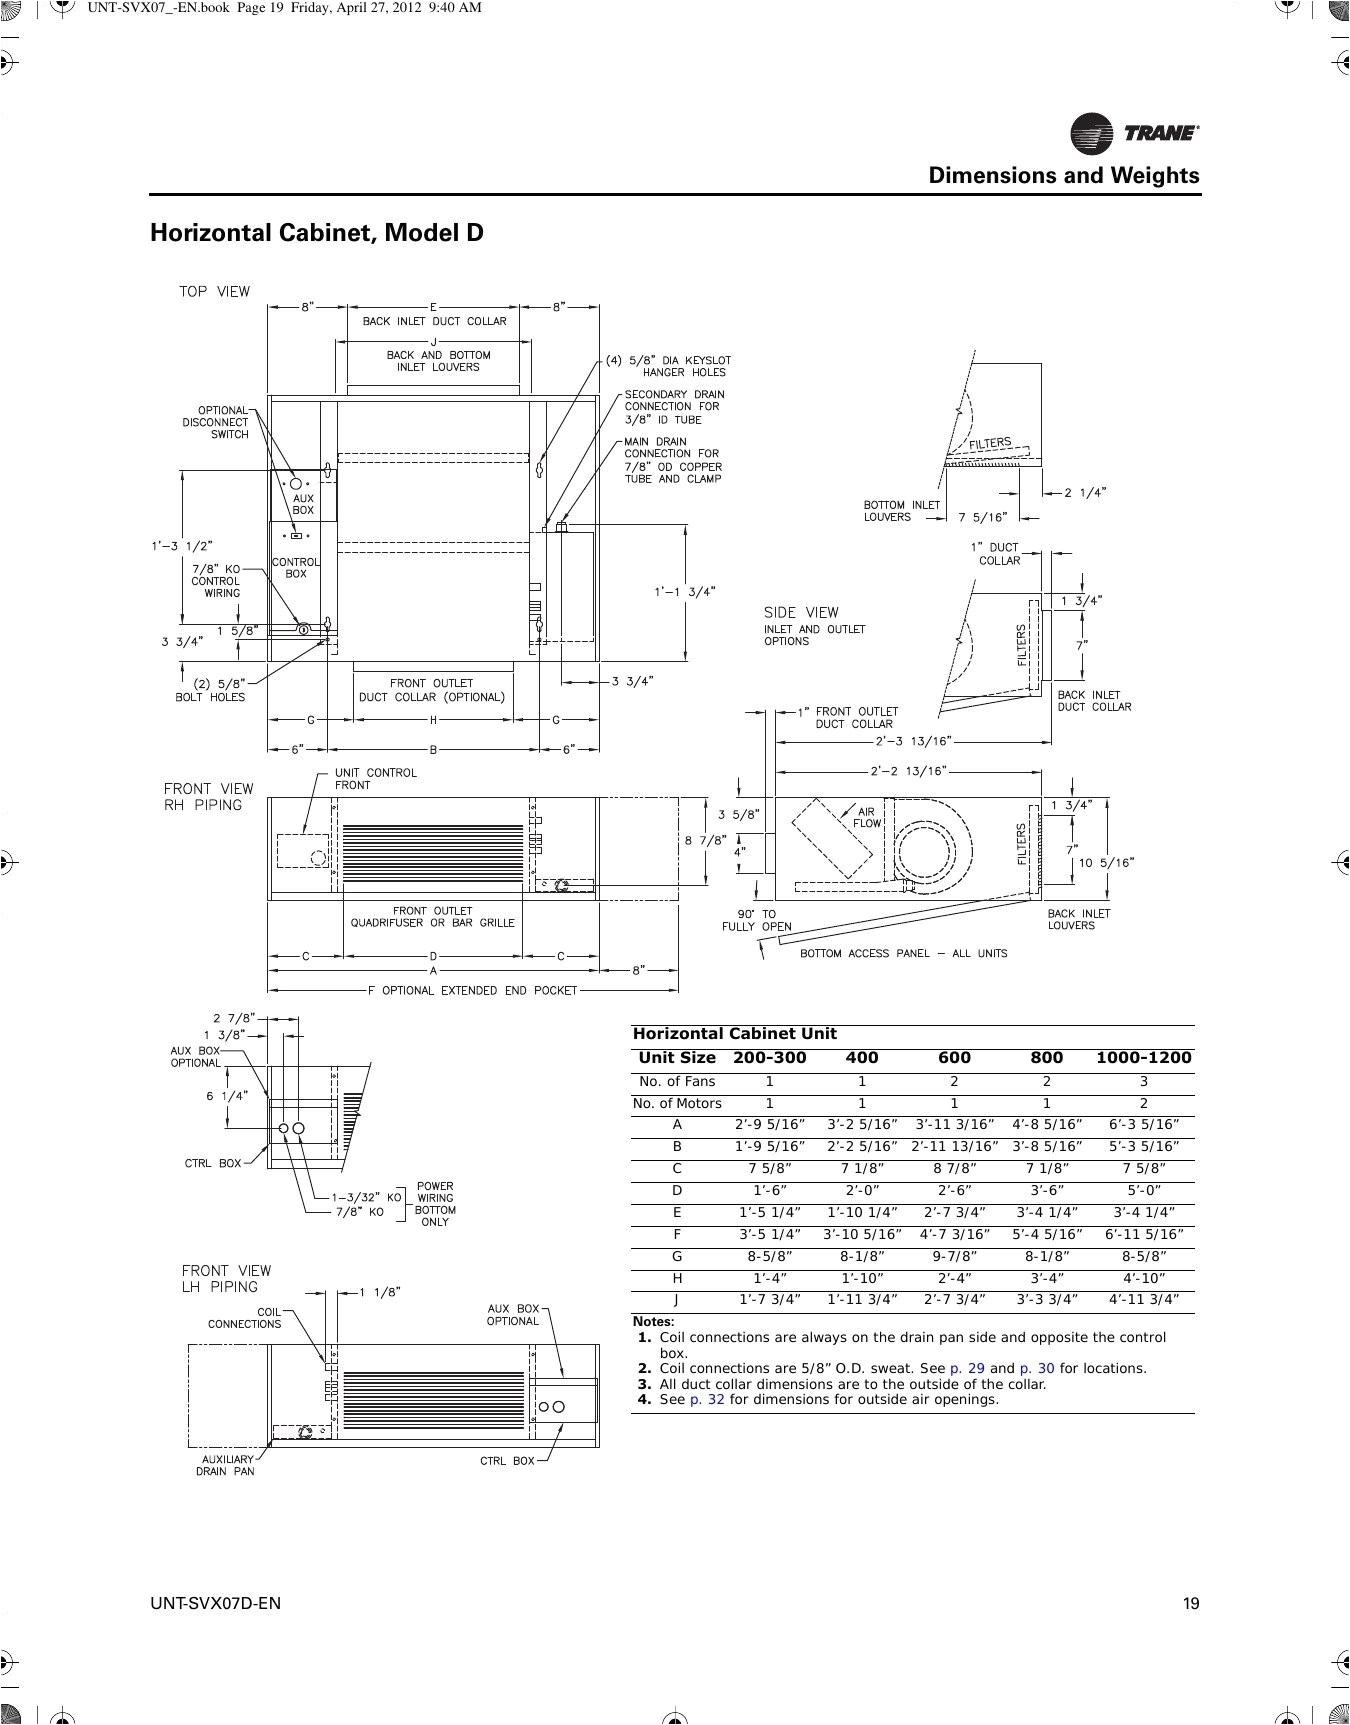 trane furnace wiring diagram trane electric furnace wiring diagram new inspirational trane wiring diagram heat pump 3b jpg